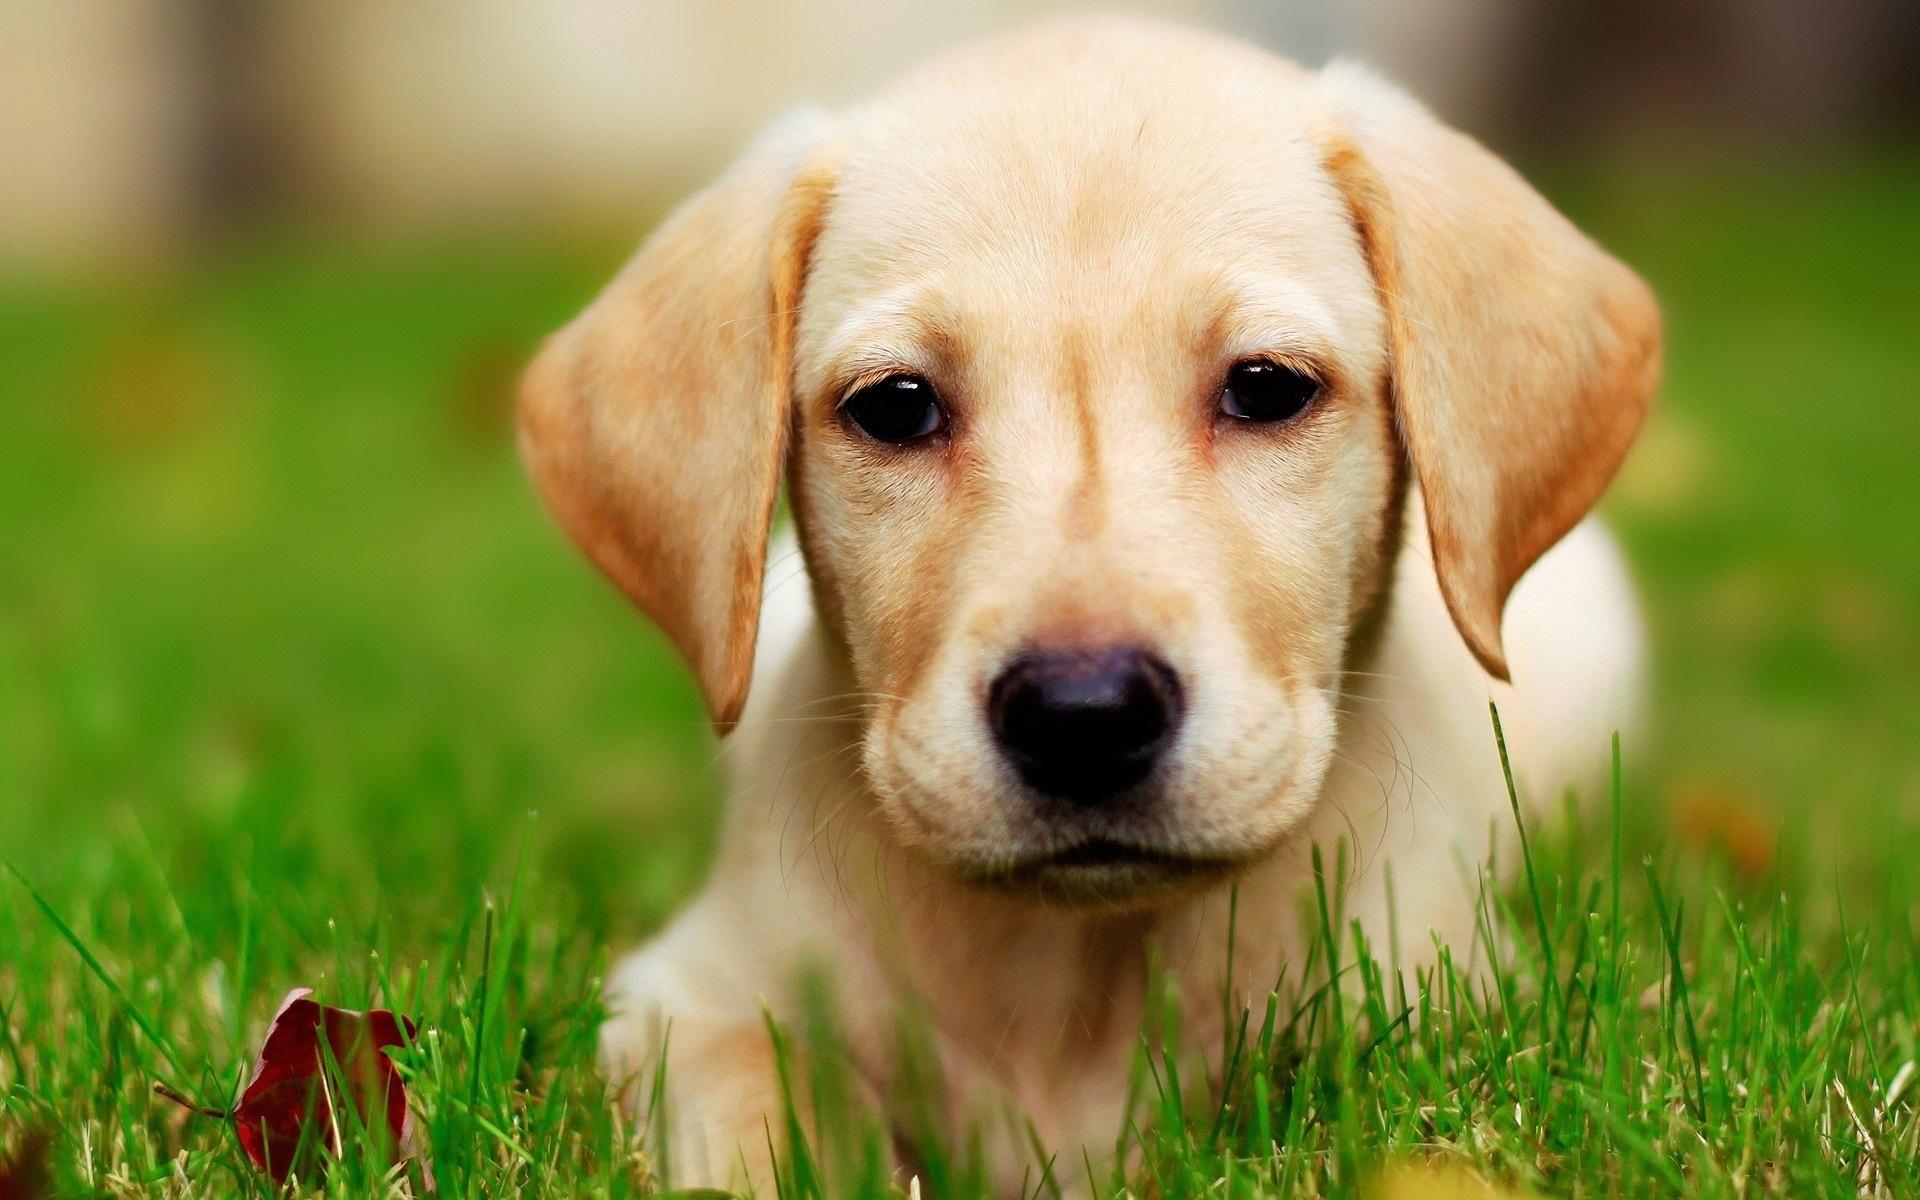 Adorable Golden Retriever Puppy Wallpaper Dog Breeders Guide